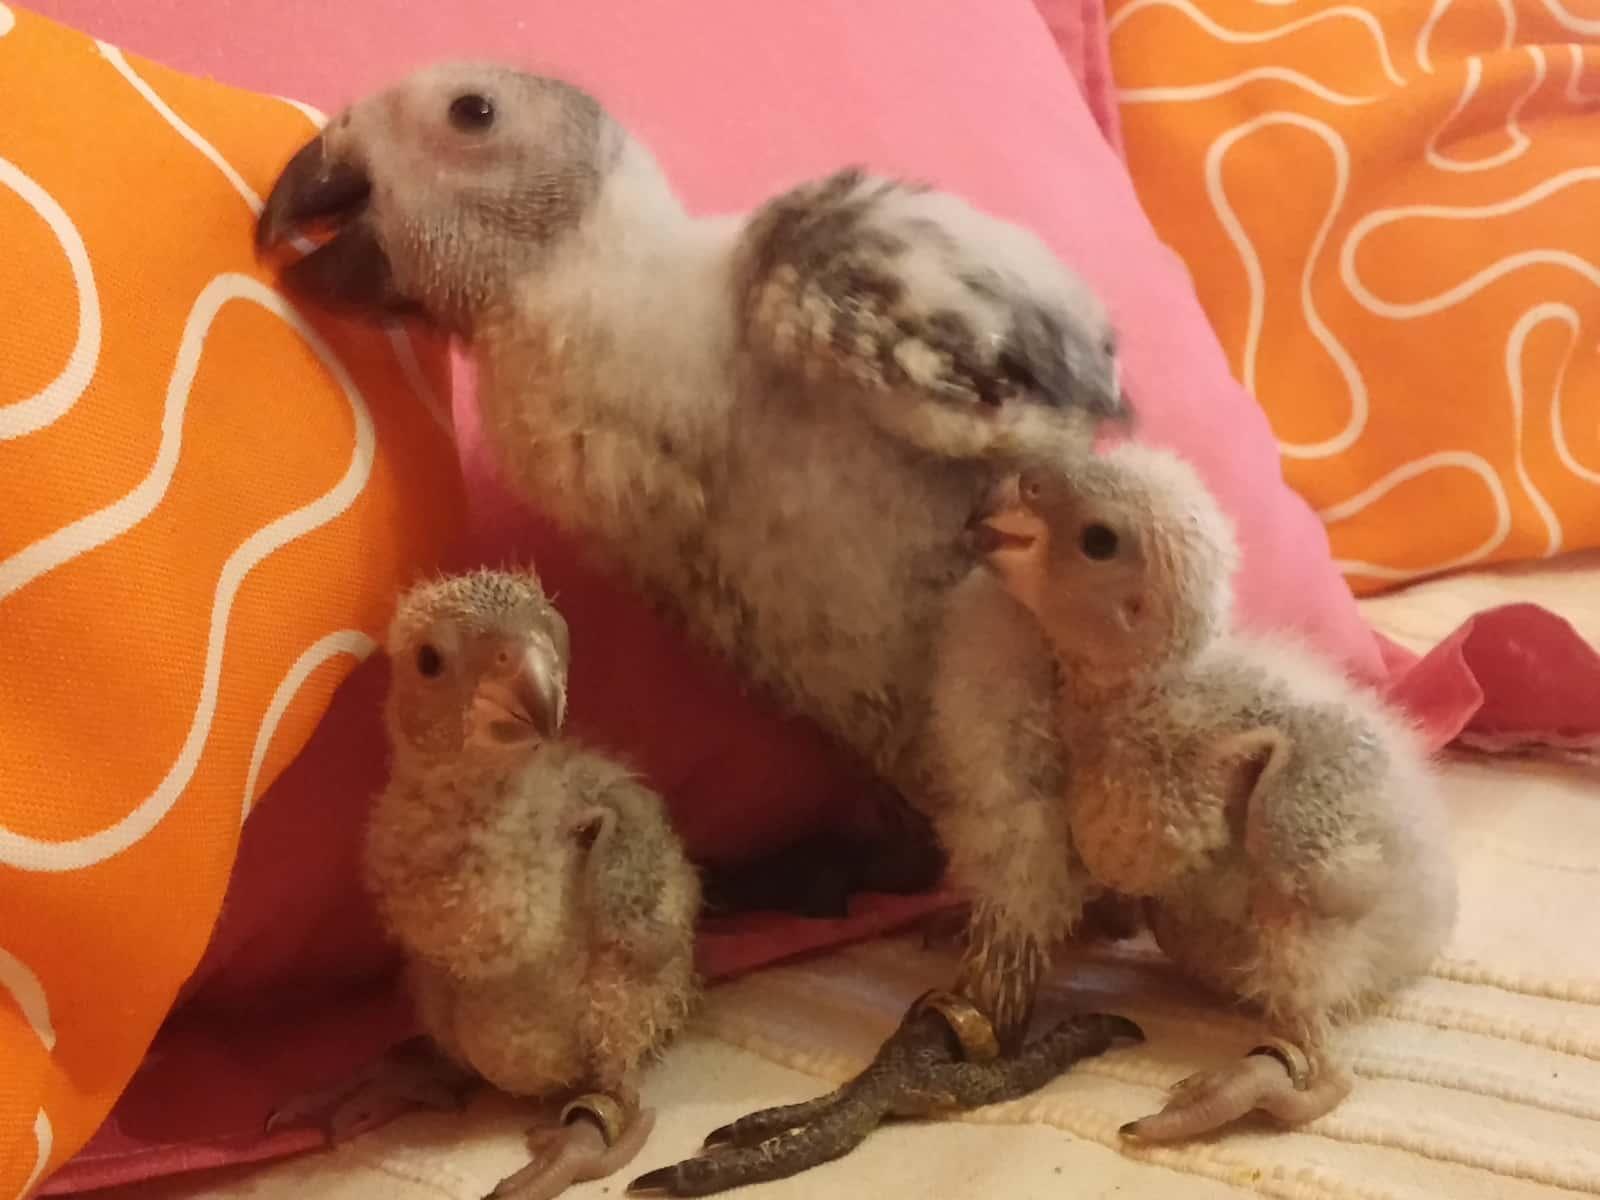 Puri's baby parrots